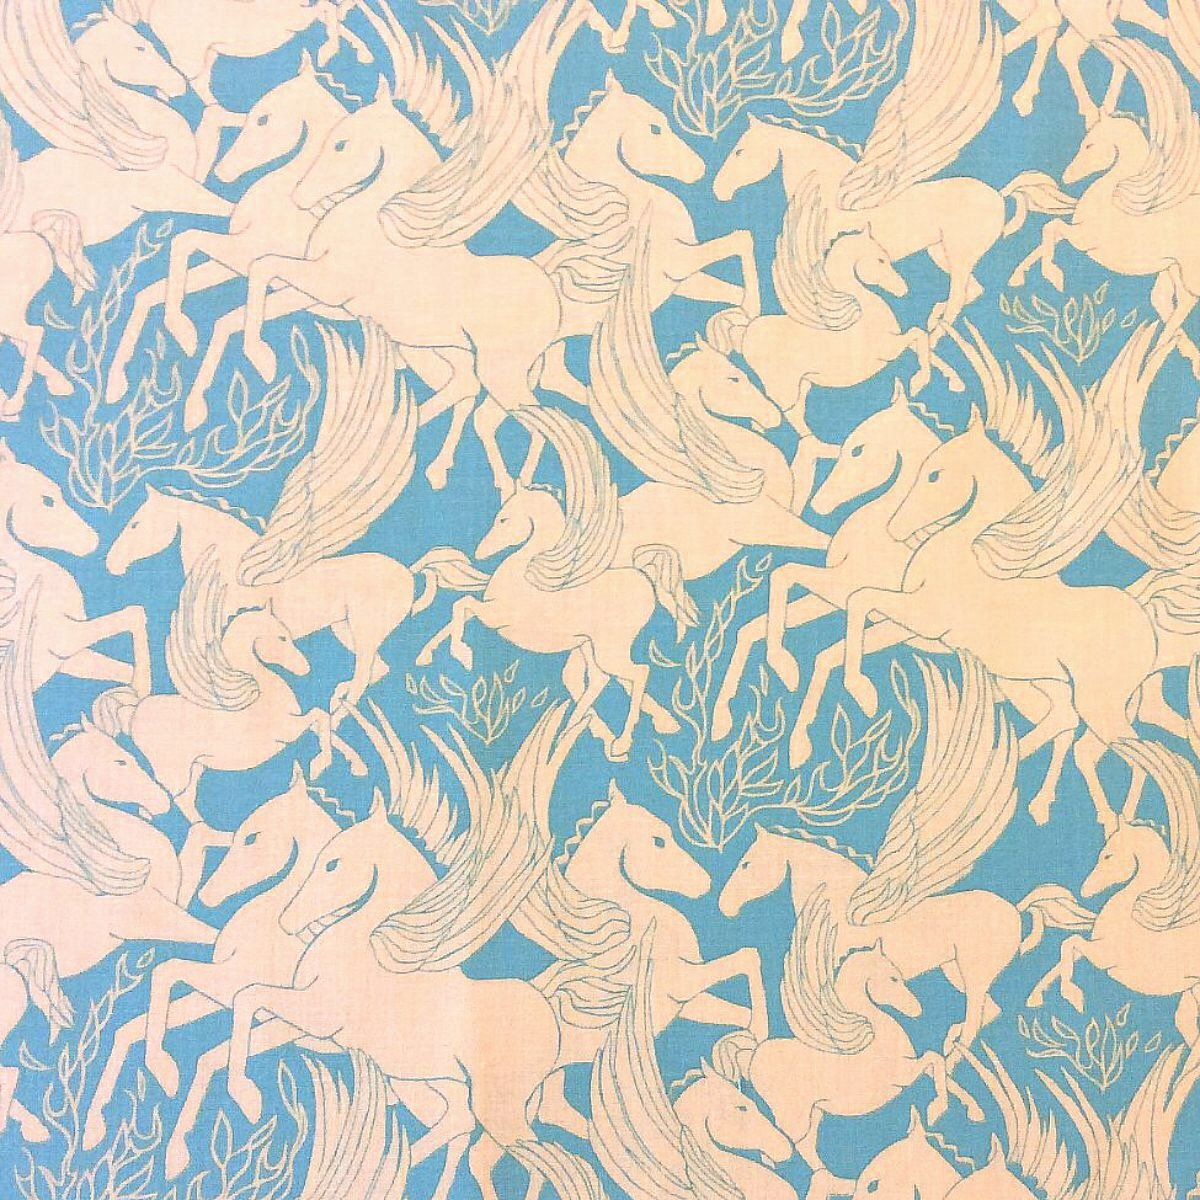 Fibs and Fables Athena Pegasus Horse Mythology Cotton Quilt Fabric WE145